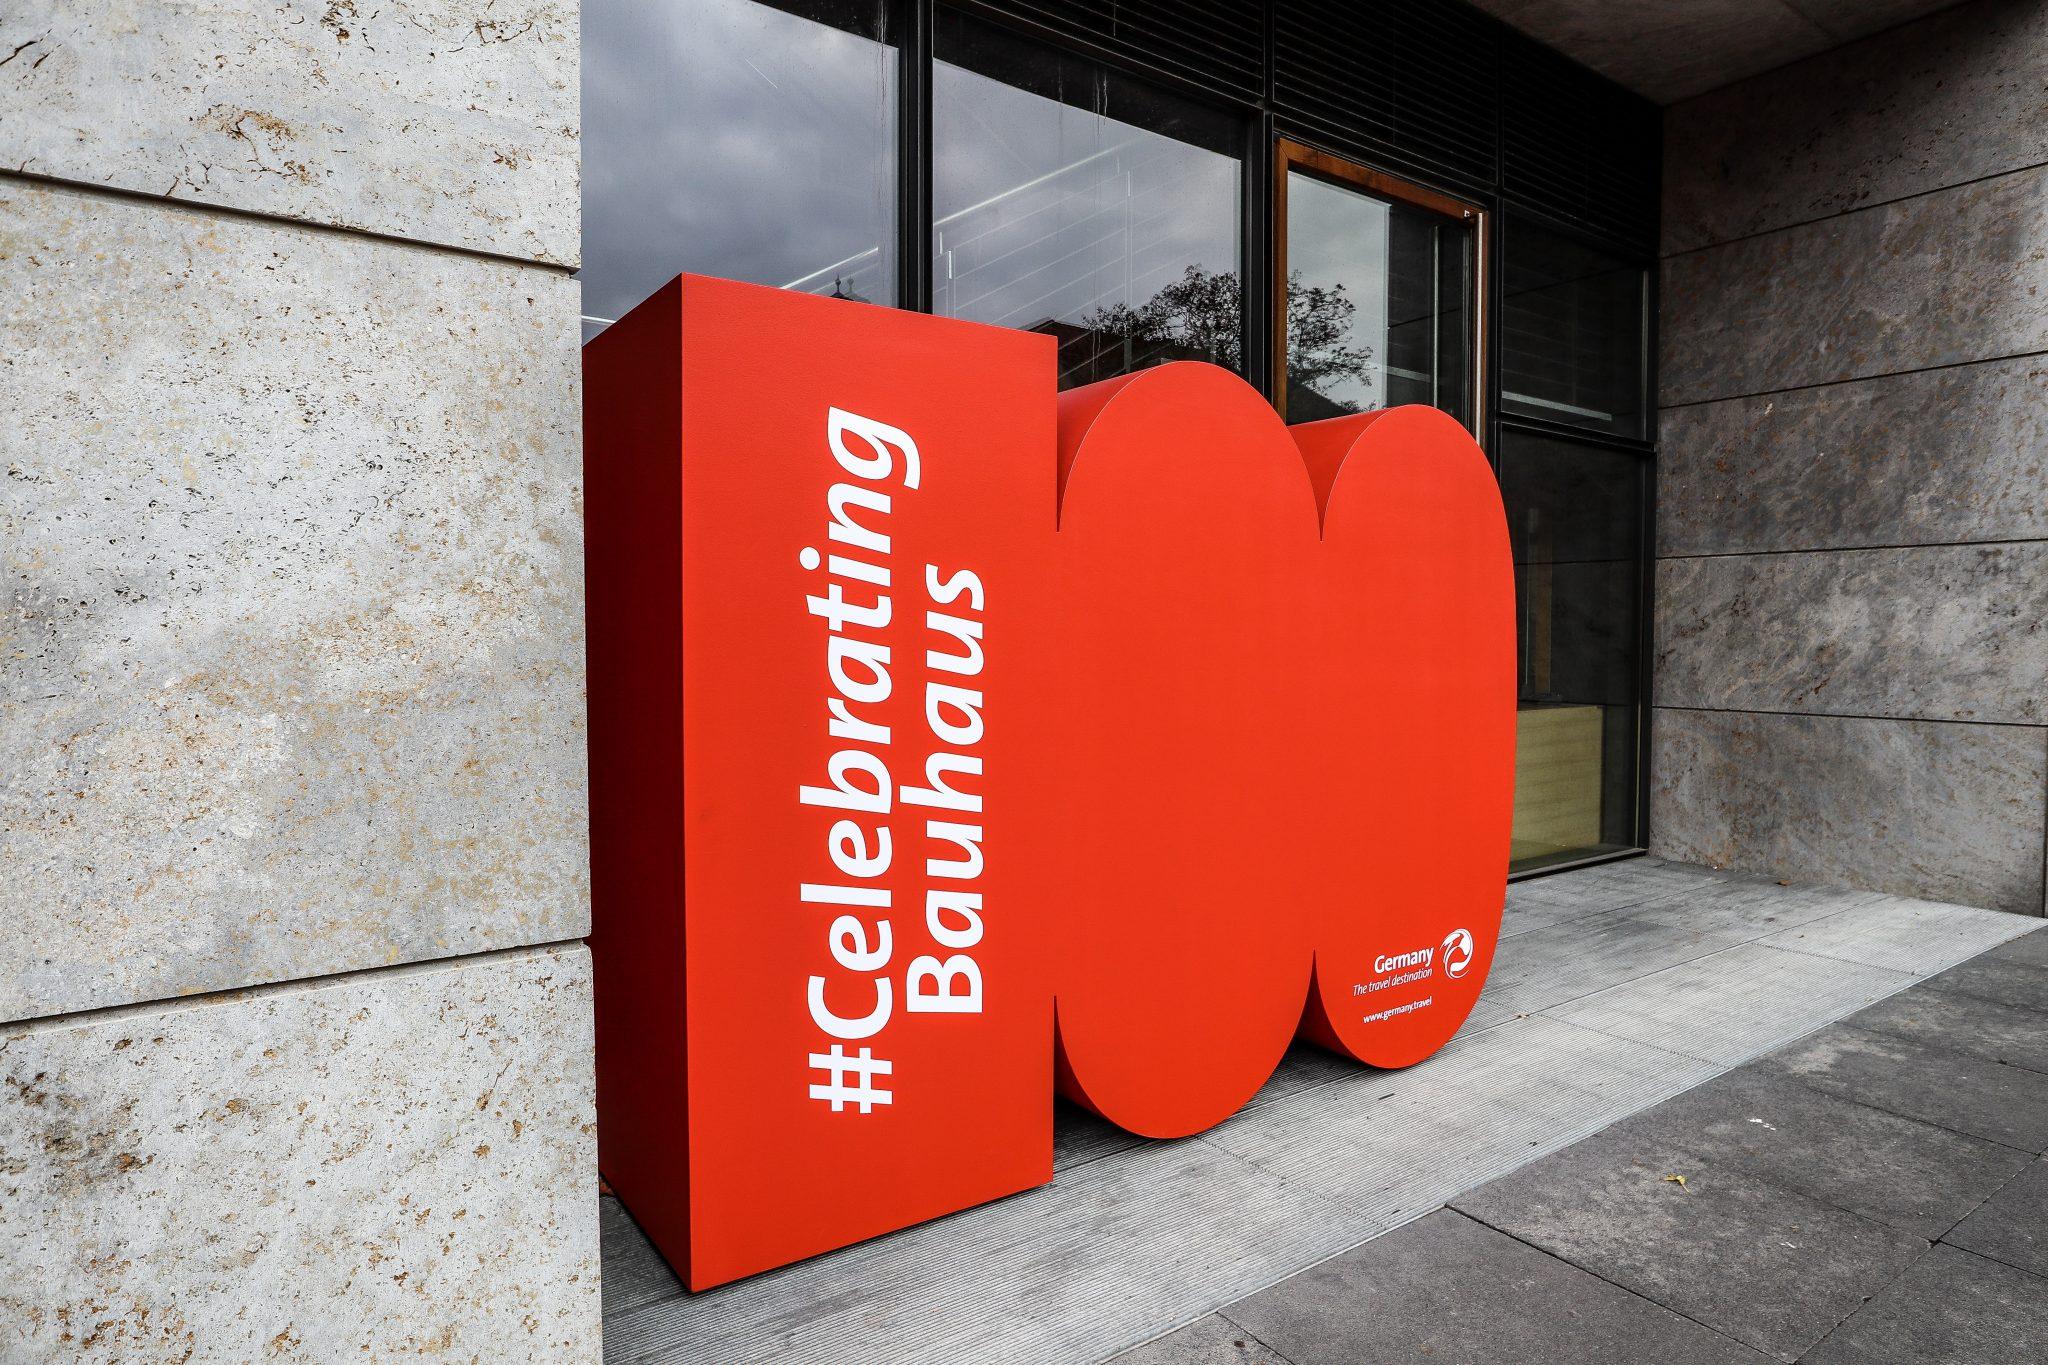 Bauhaus Centenary 2019 in Germany